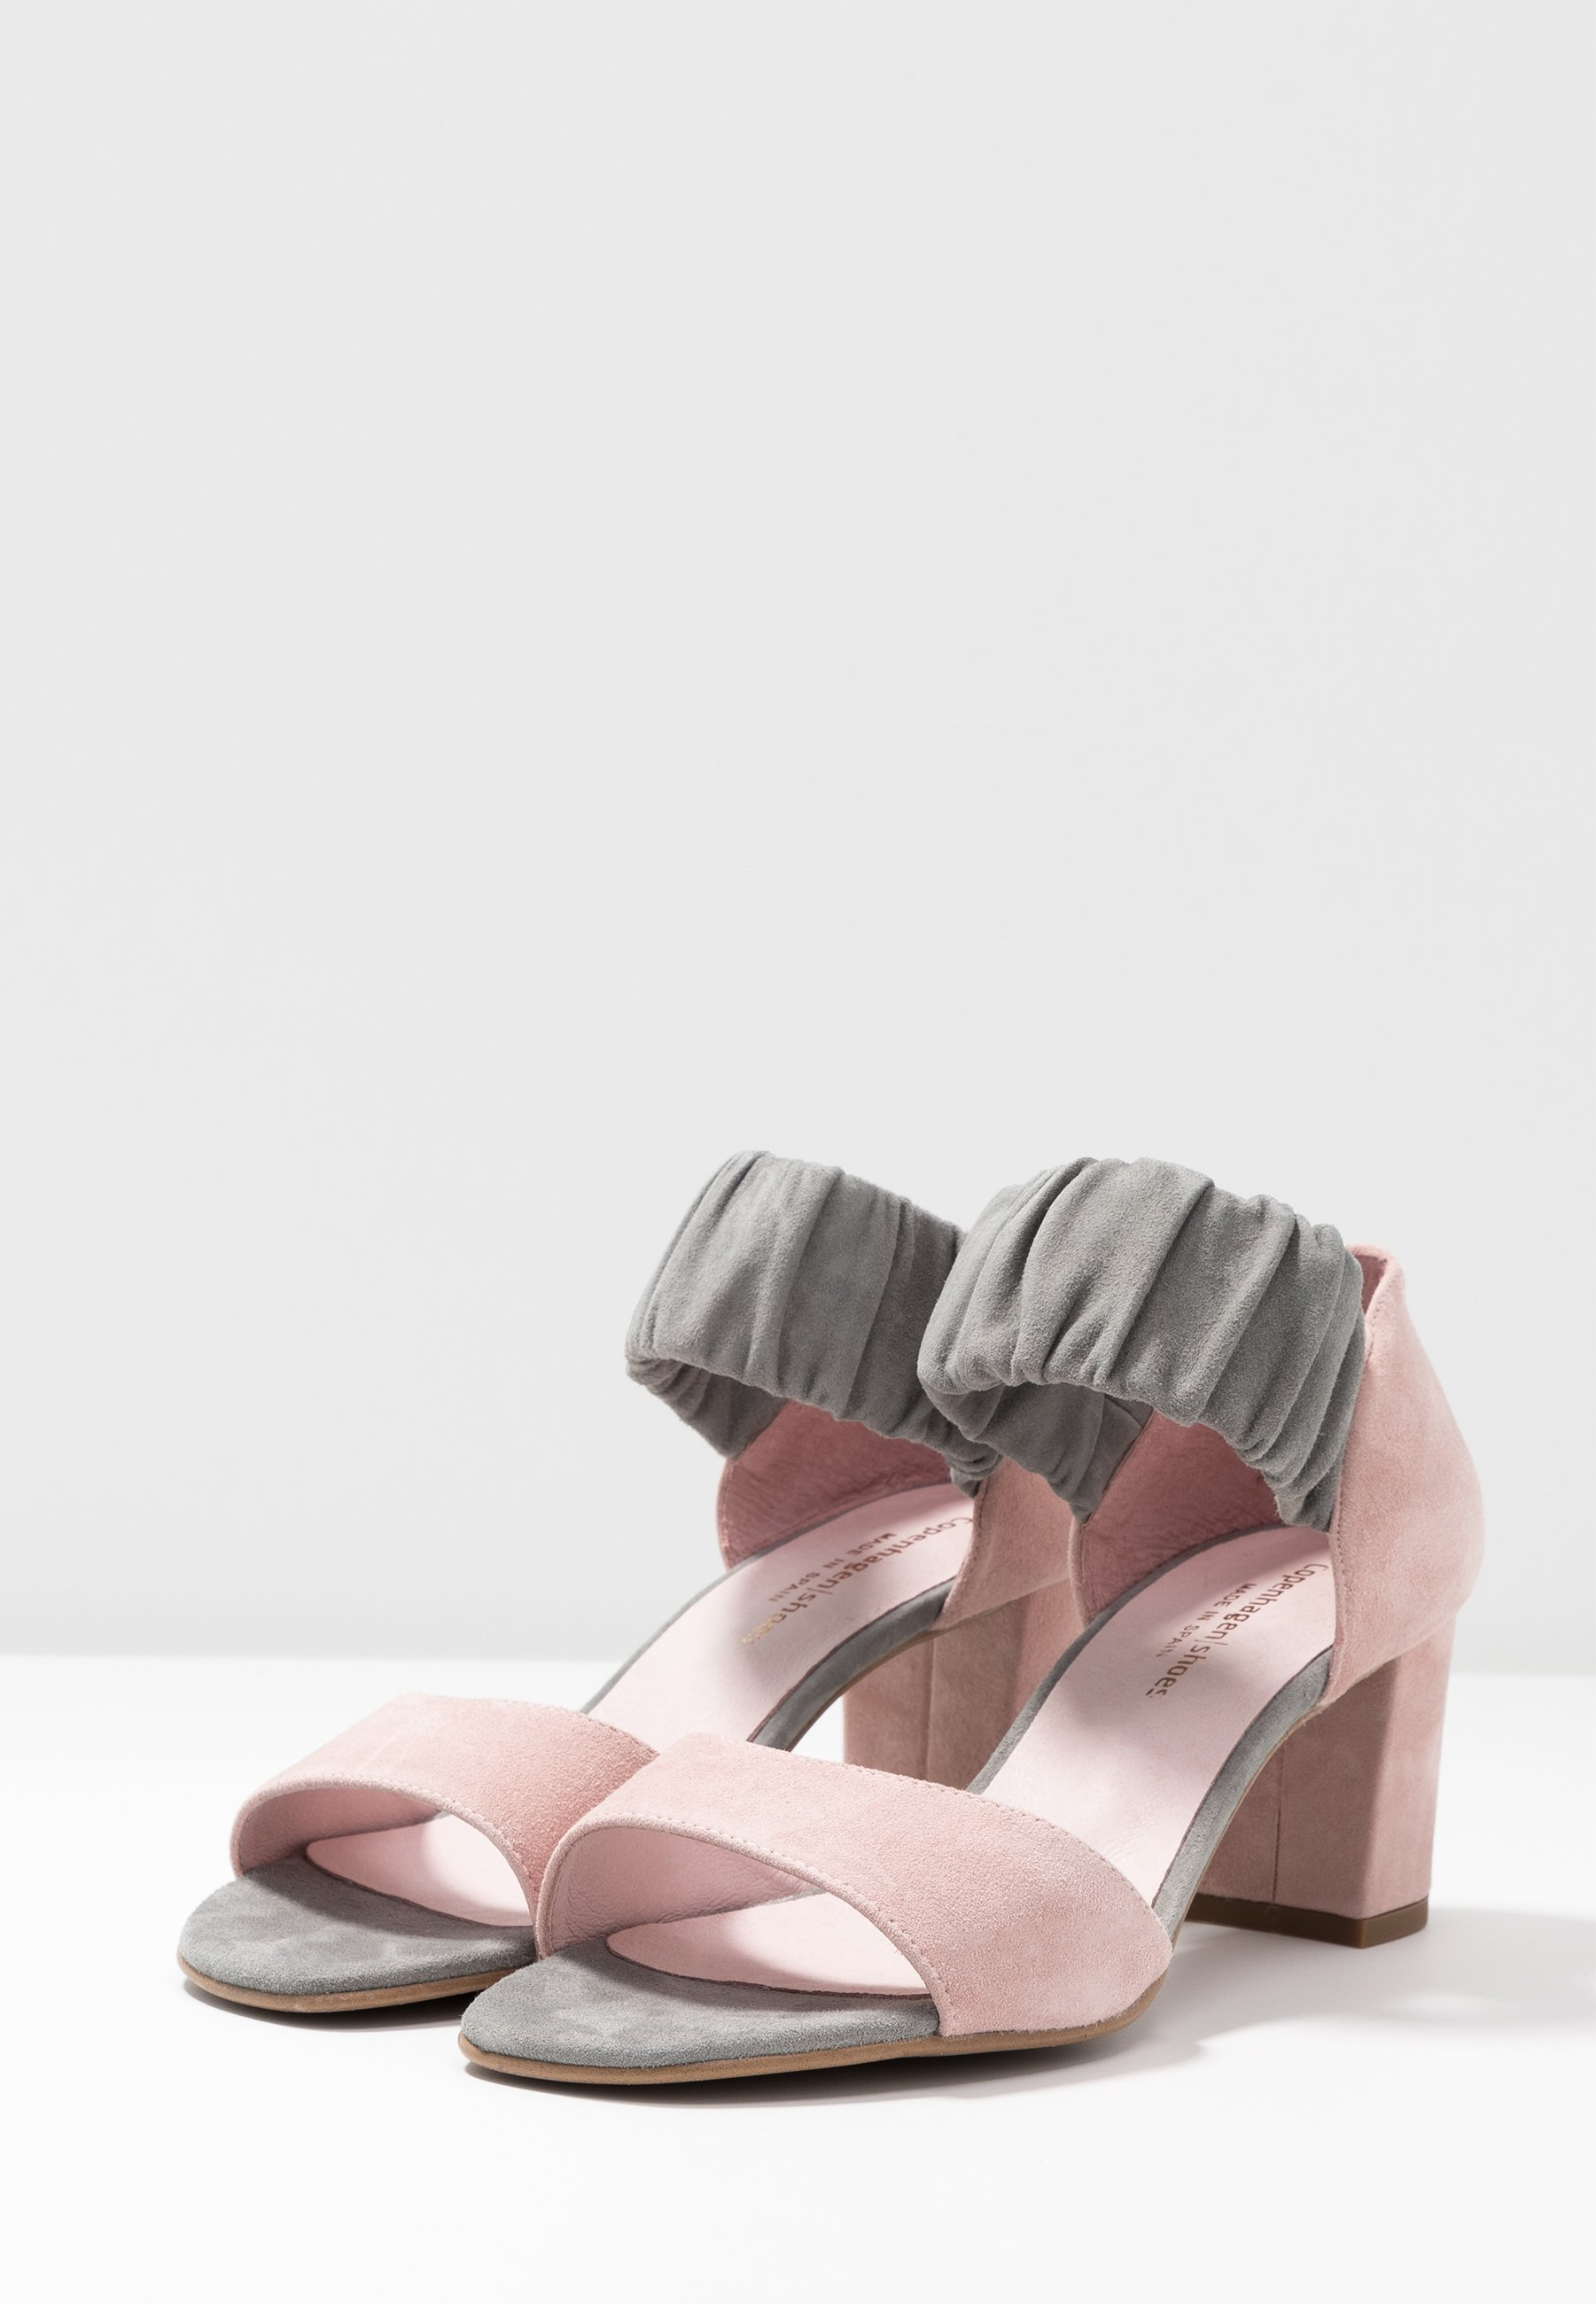 Copenhagen Shoes Me And - Sandals Grey/rosa